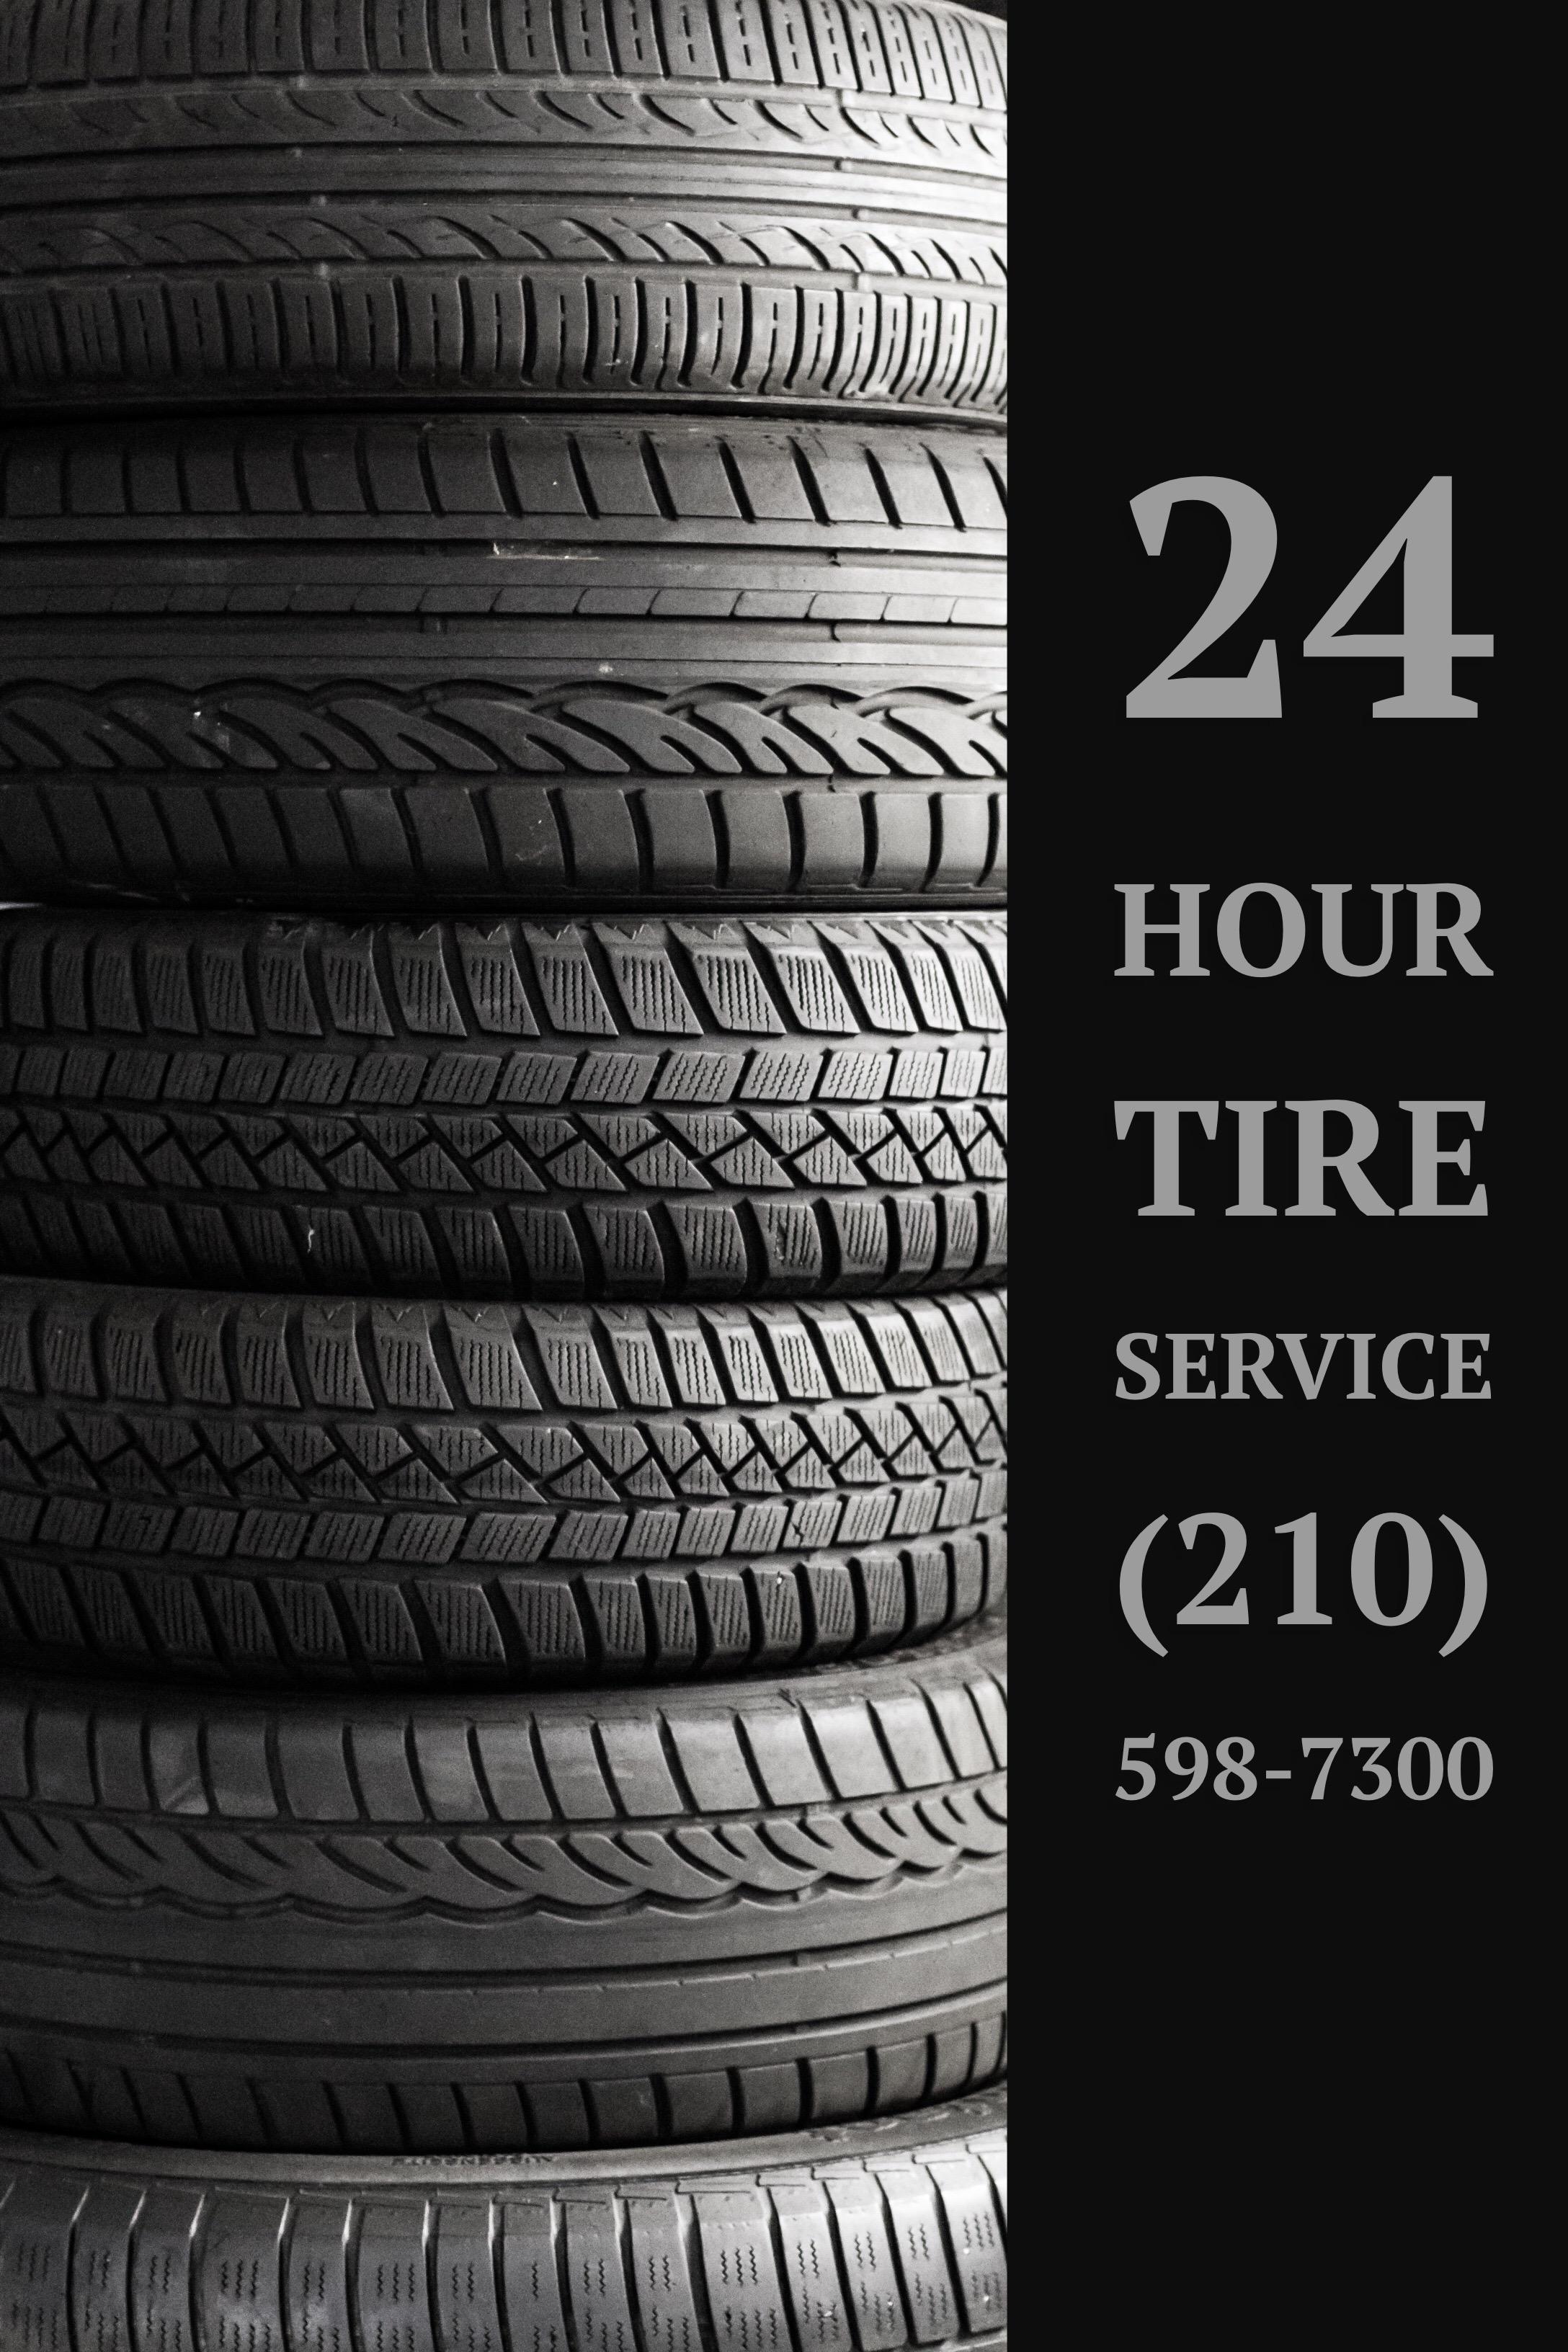 Mobile Tire Service San Antonio